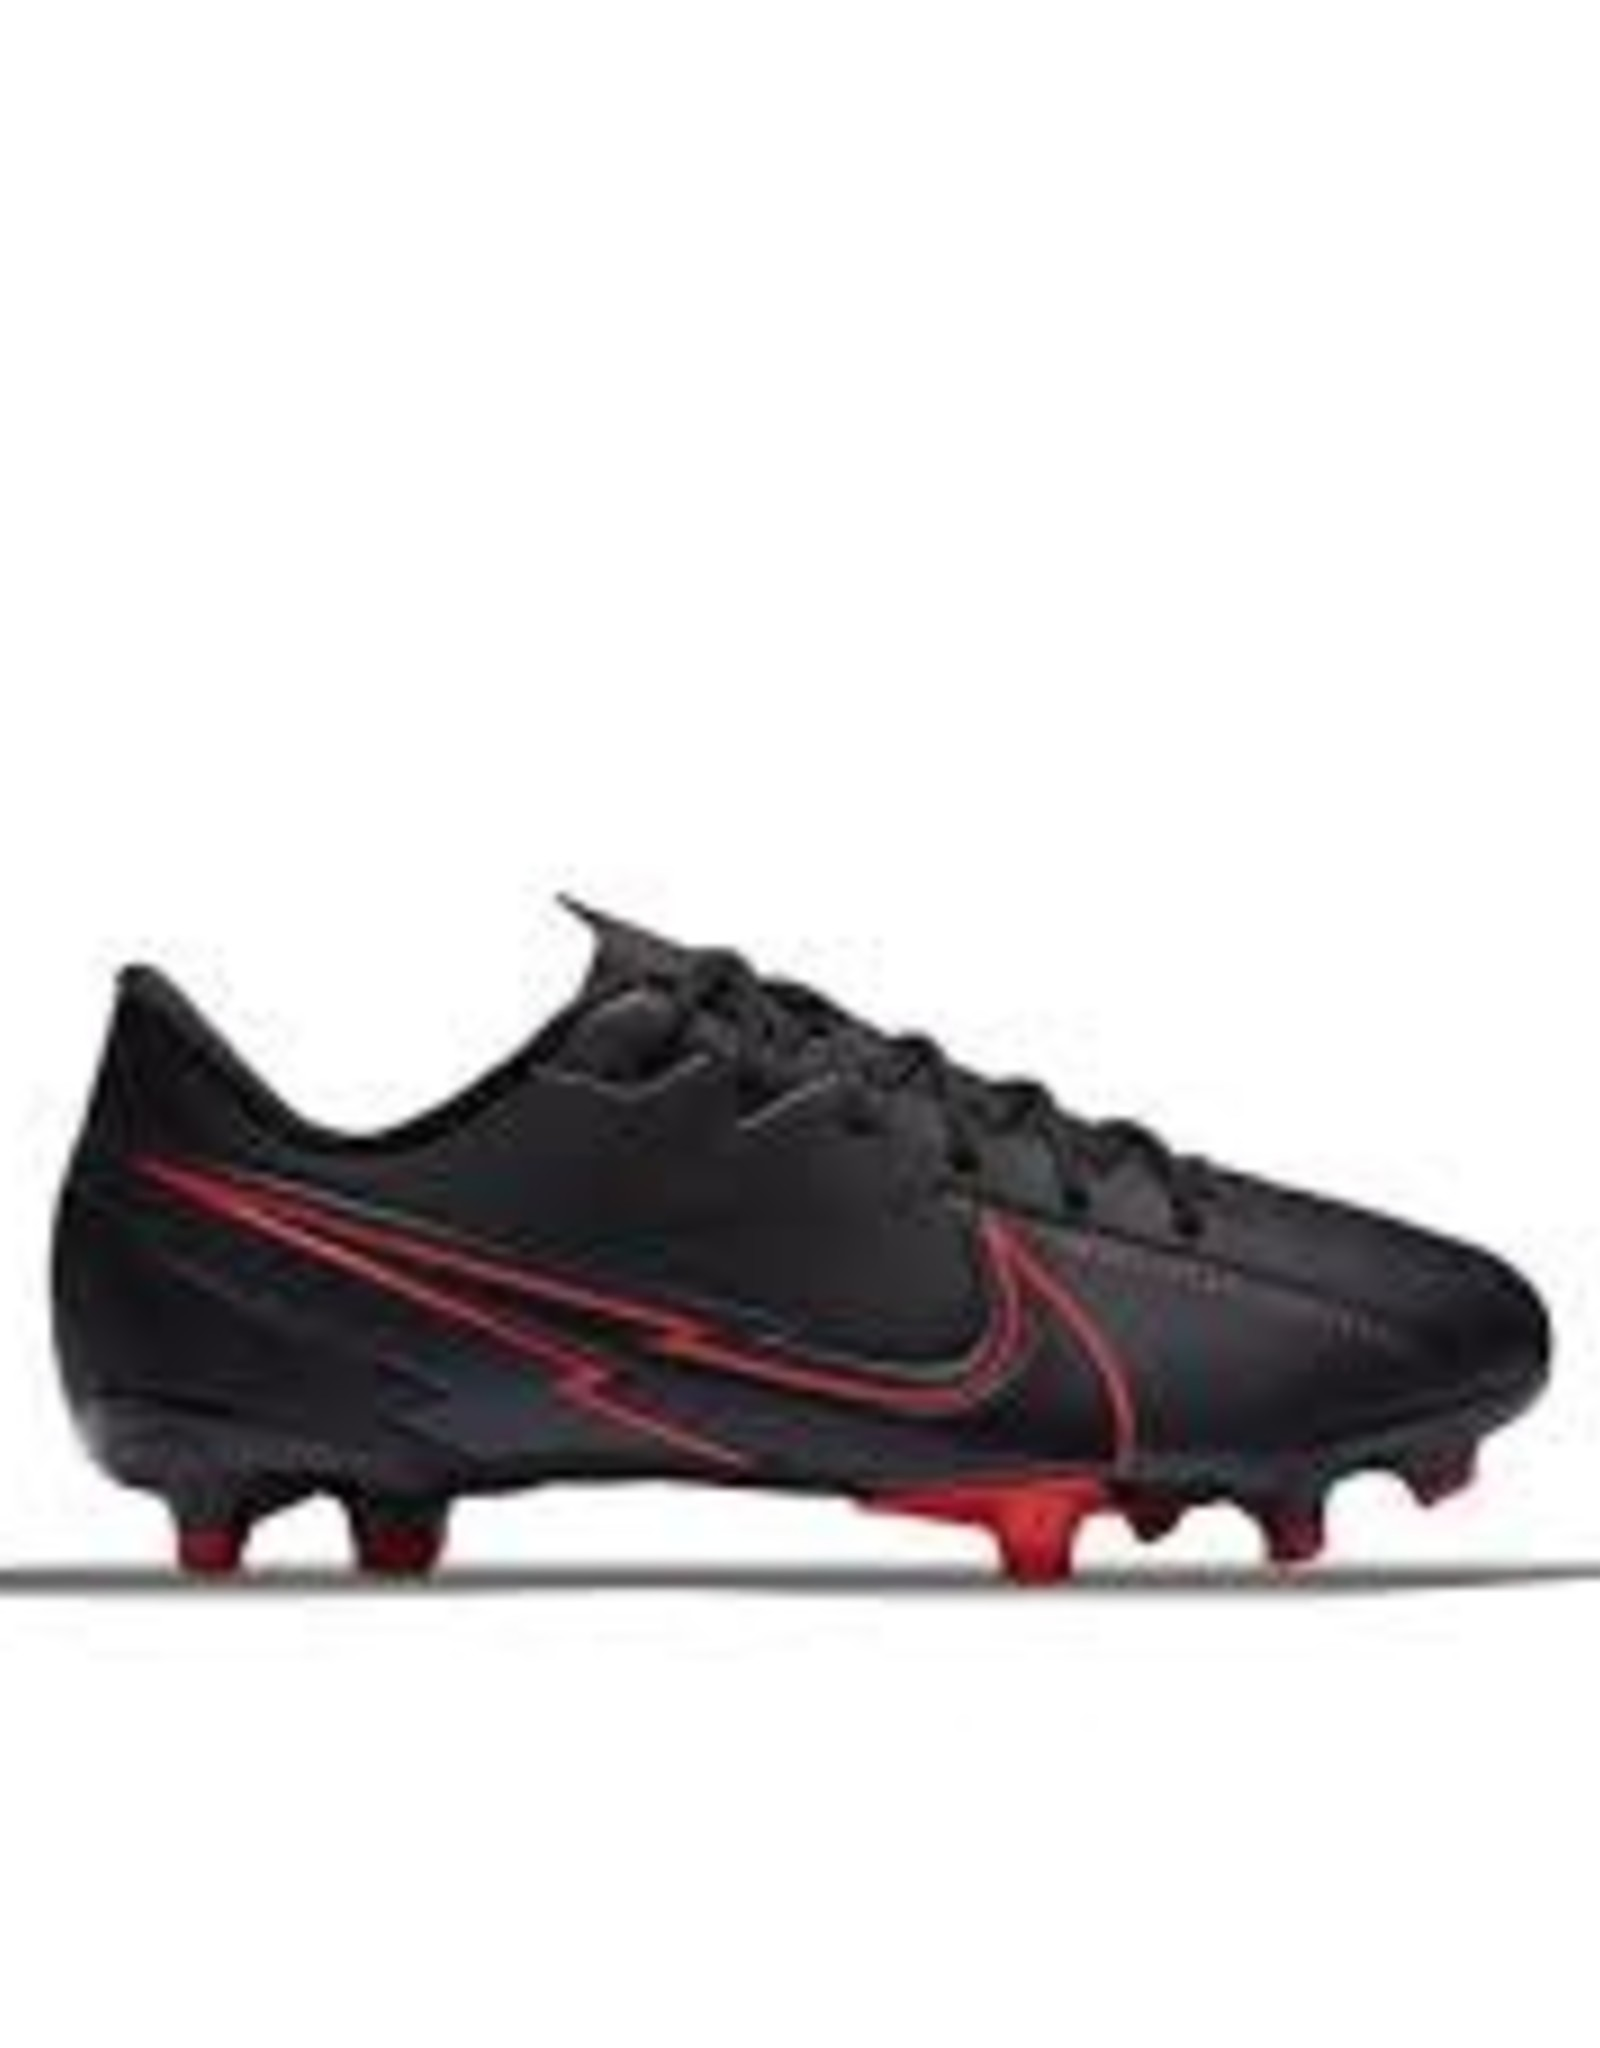 Nike Vapor 13 Academy Jr